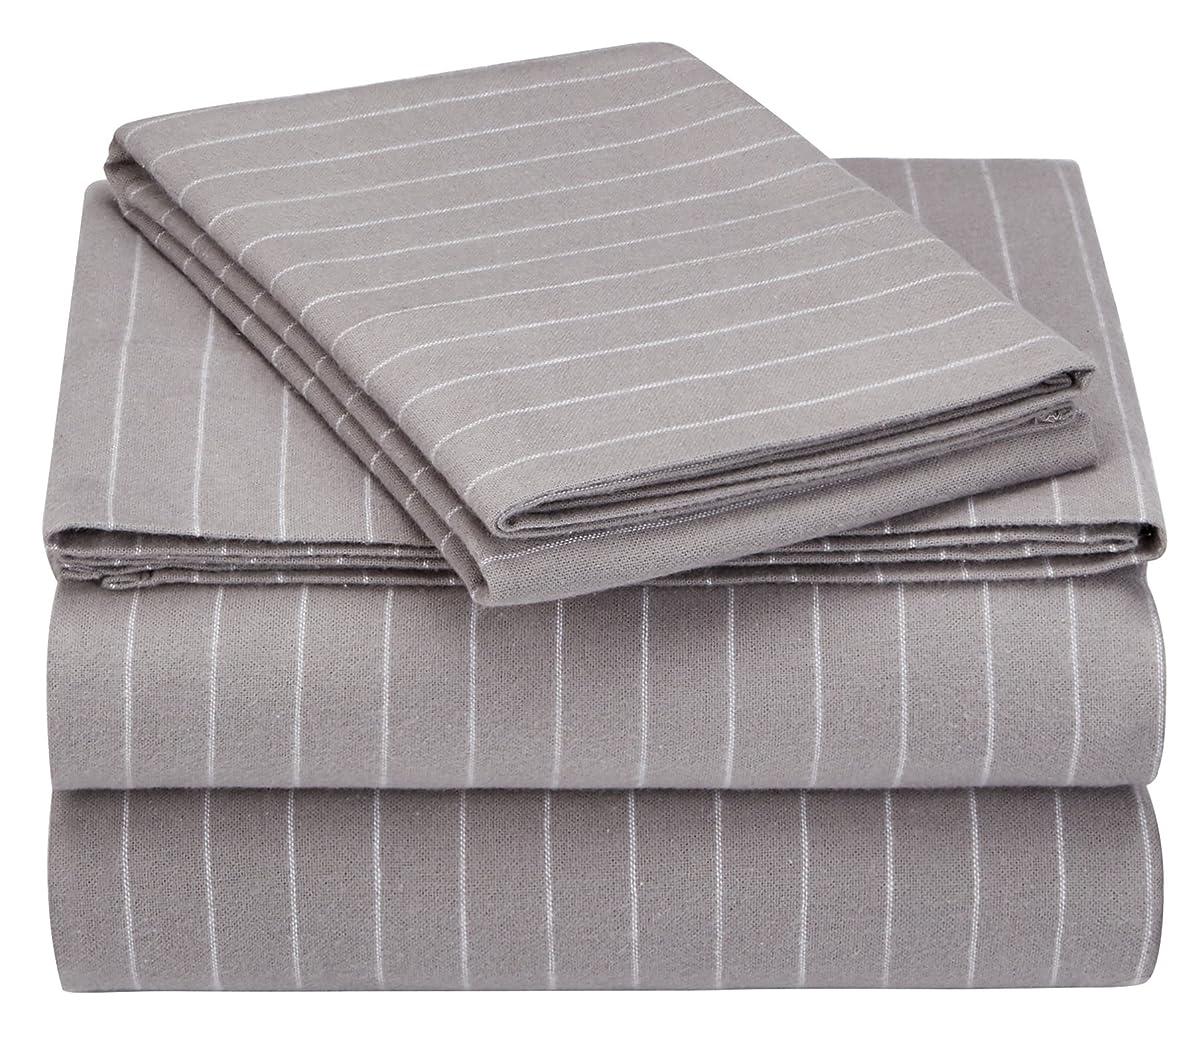 Pinzon 160 Gram Pinstripe Flannel Sheet Set - Twin, Grey Pinstripe - PZ-PLFLAN-GP-TN